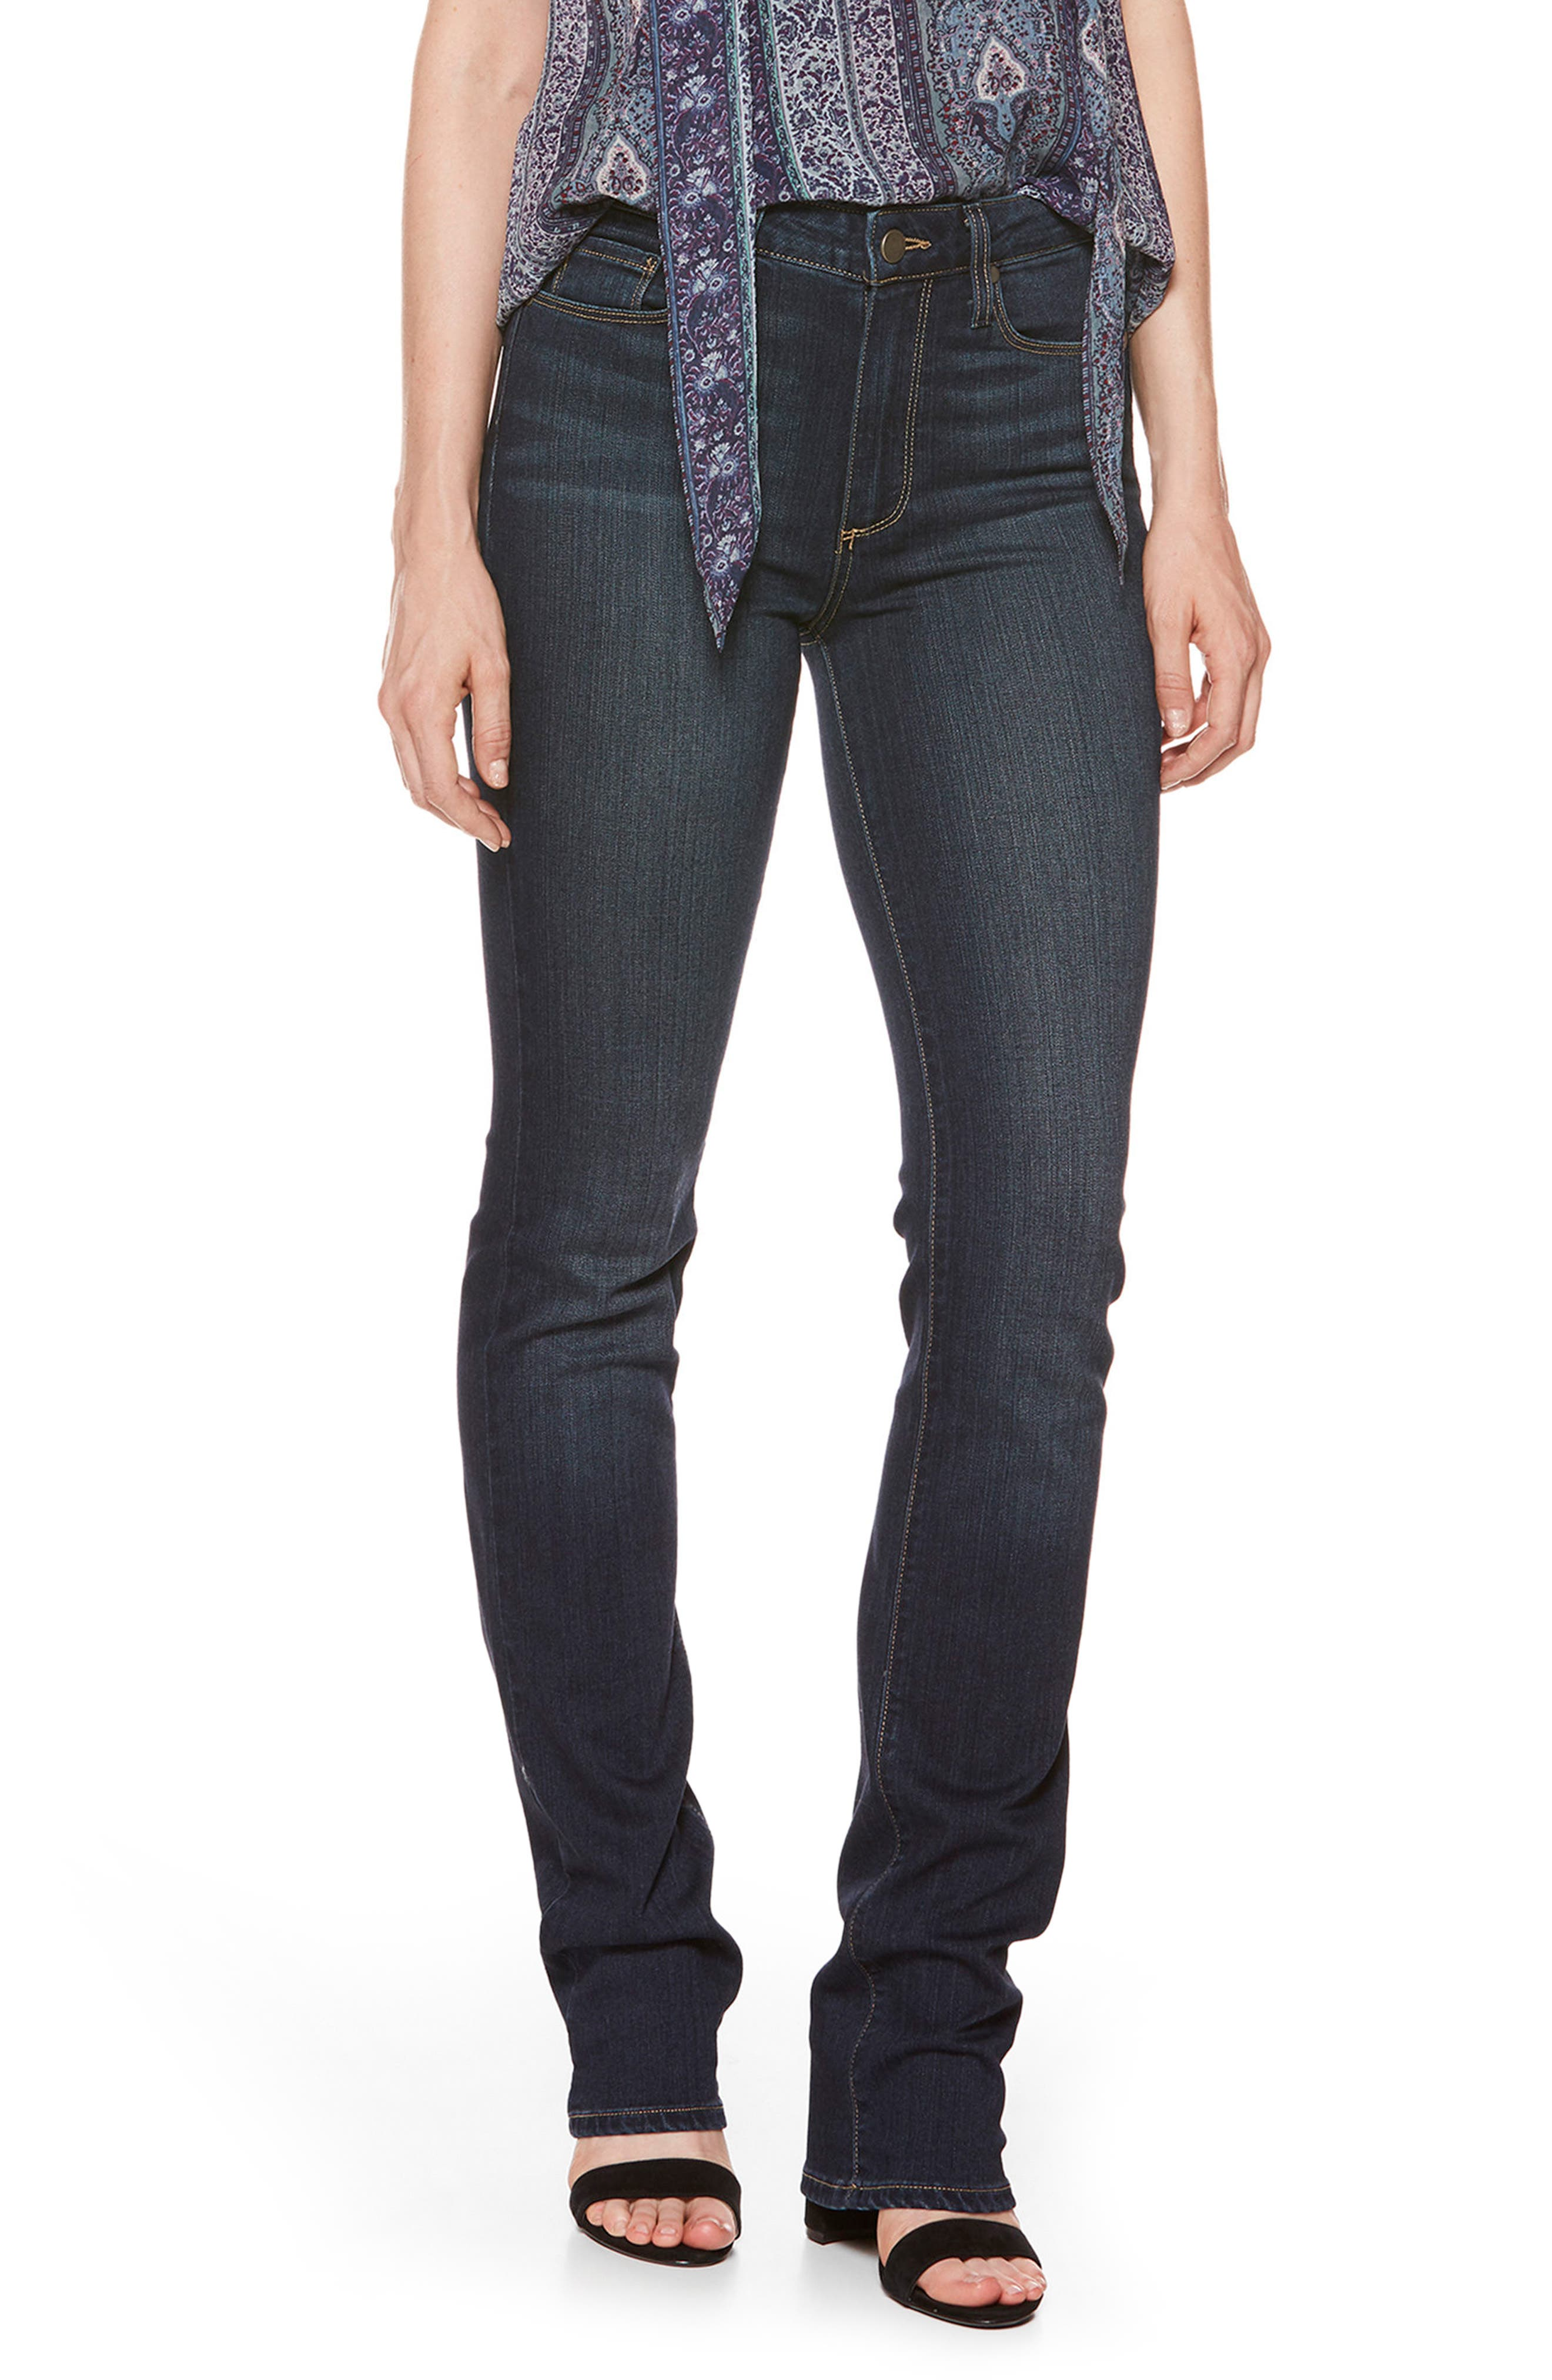 'Transcend - Hoxton' High Rise Straight Leg Jeans,                             Main thumbnail 1, color,                             400